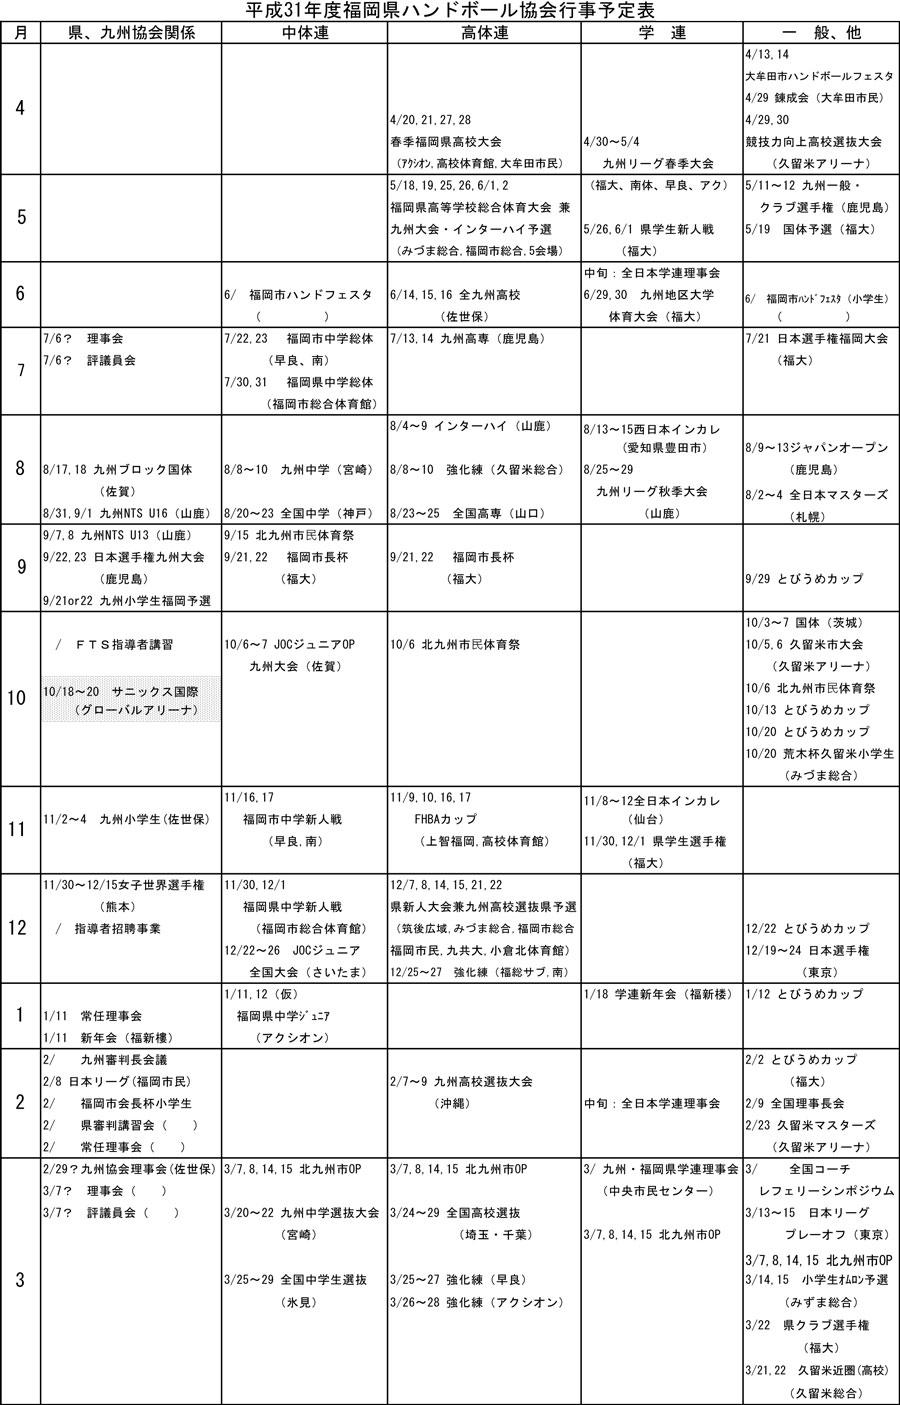 2019kyoukai_nenkan_yotei_2